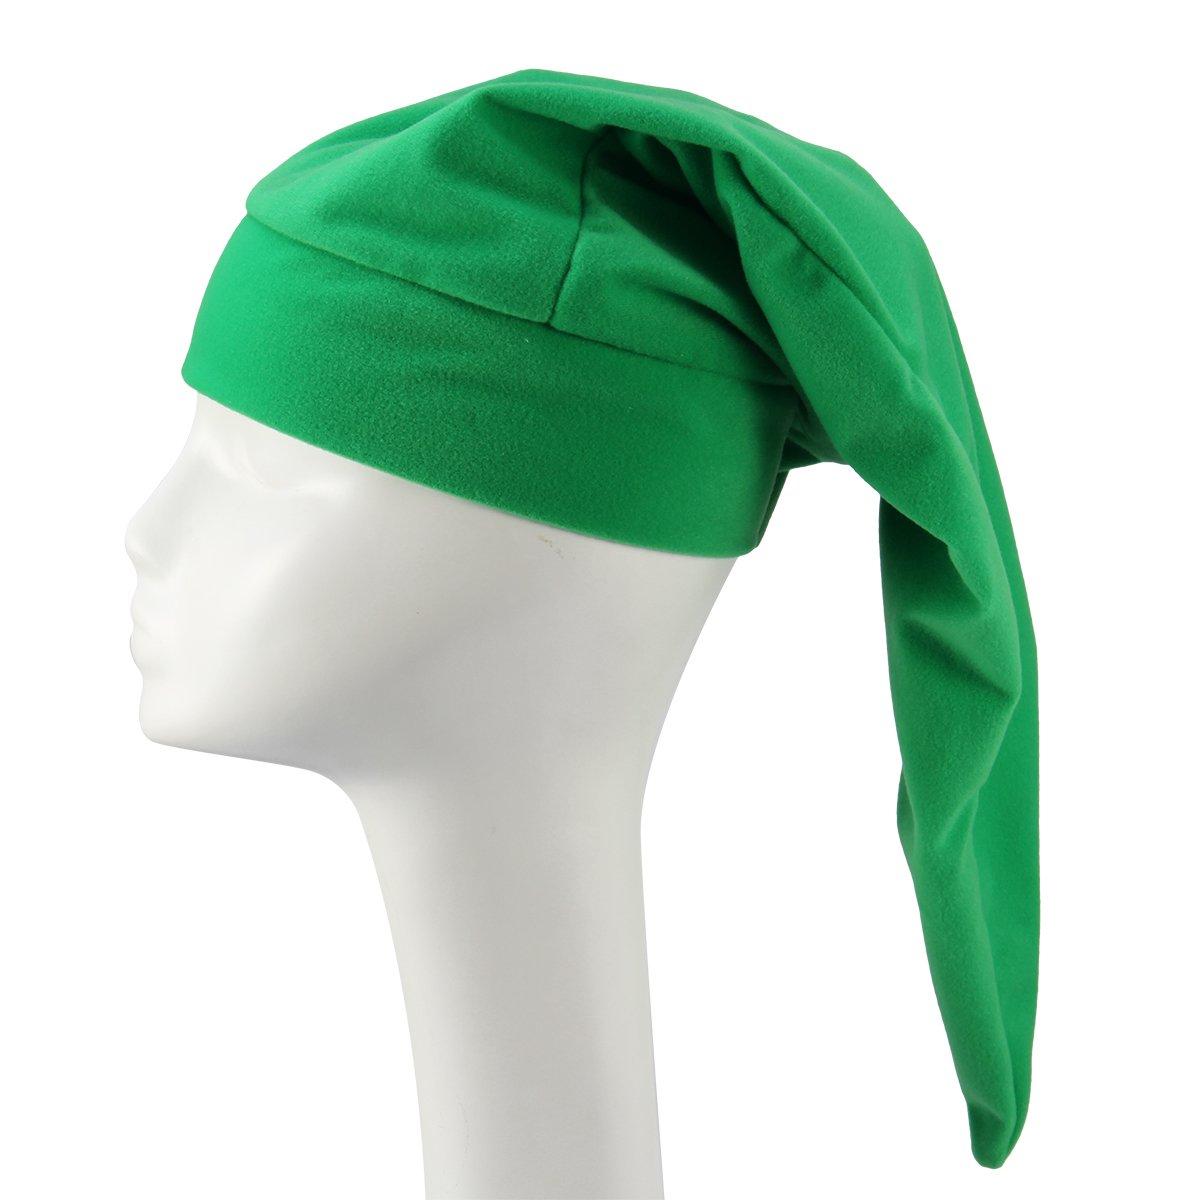 MagicFour Green GNOME Hat Cute Long Plush Felt Drama Hat Night Cap Fit Kids Adults